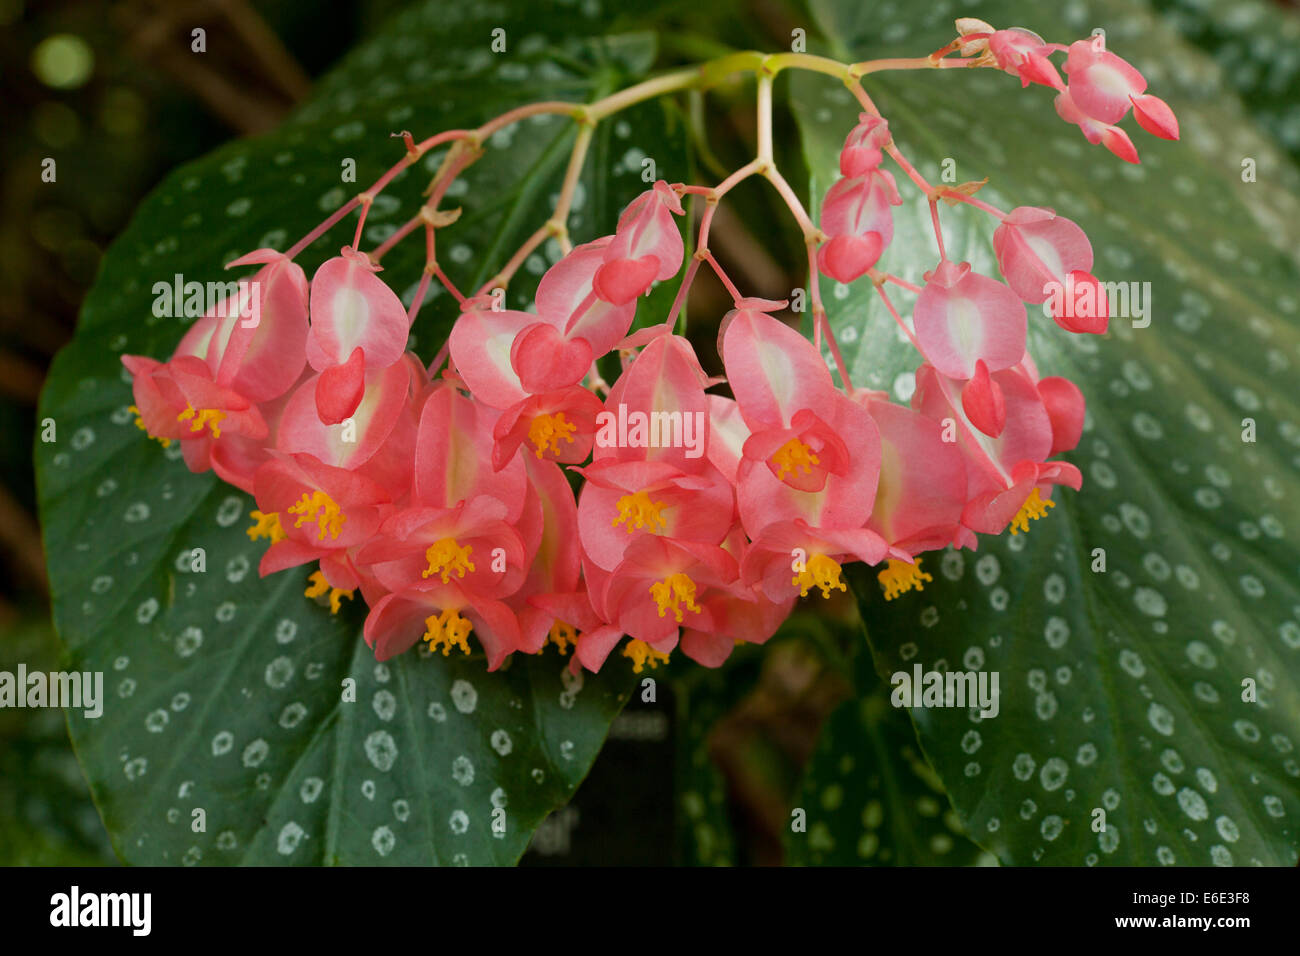 Juanita's Jewel begonia flowers Stock Photo